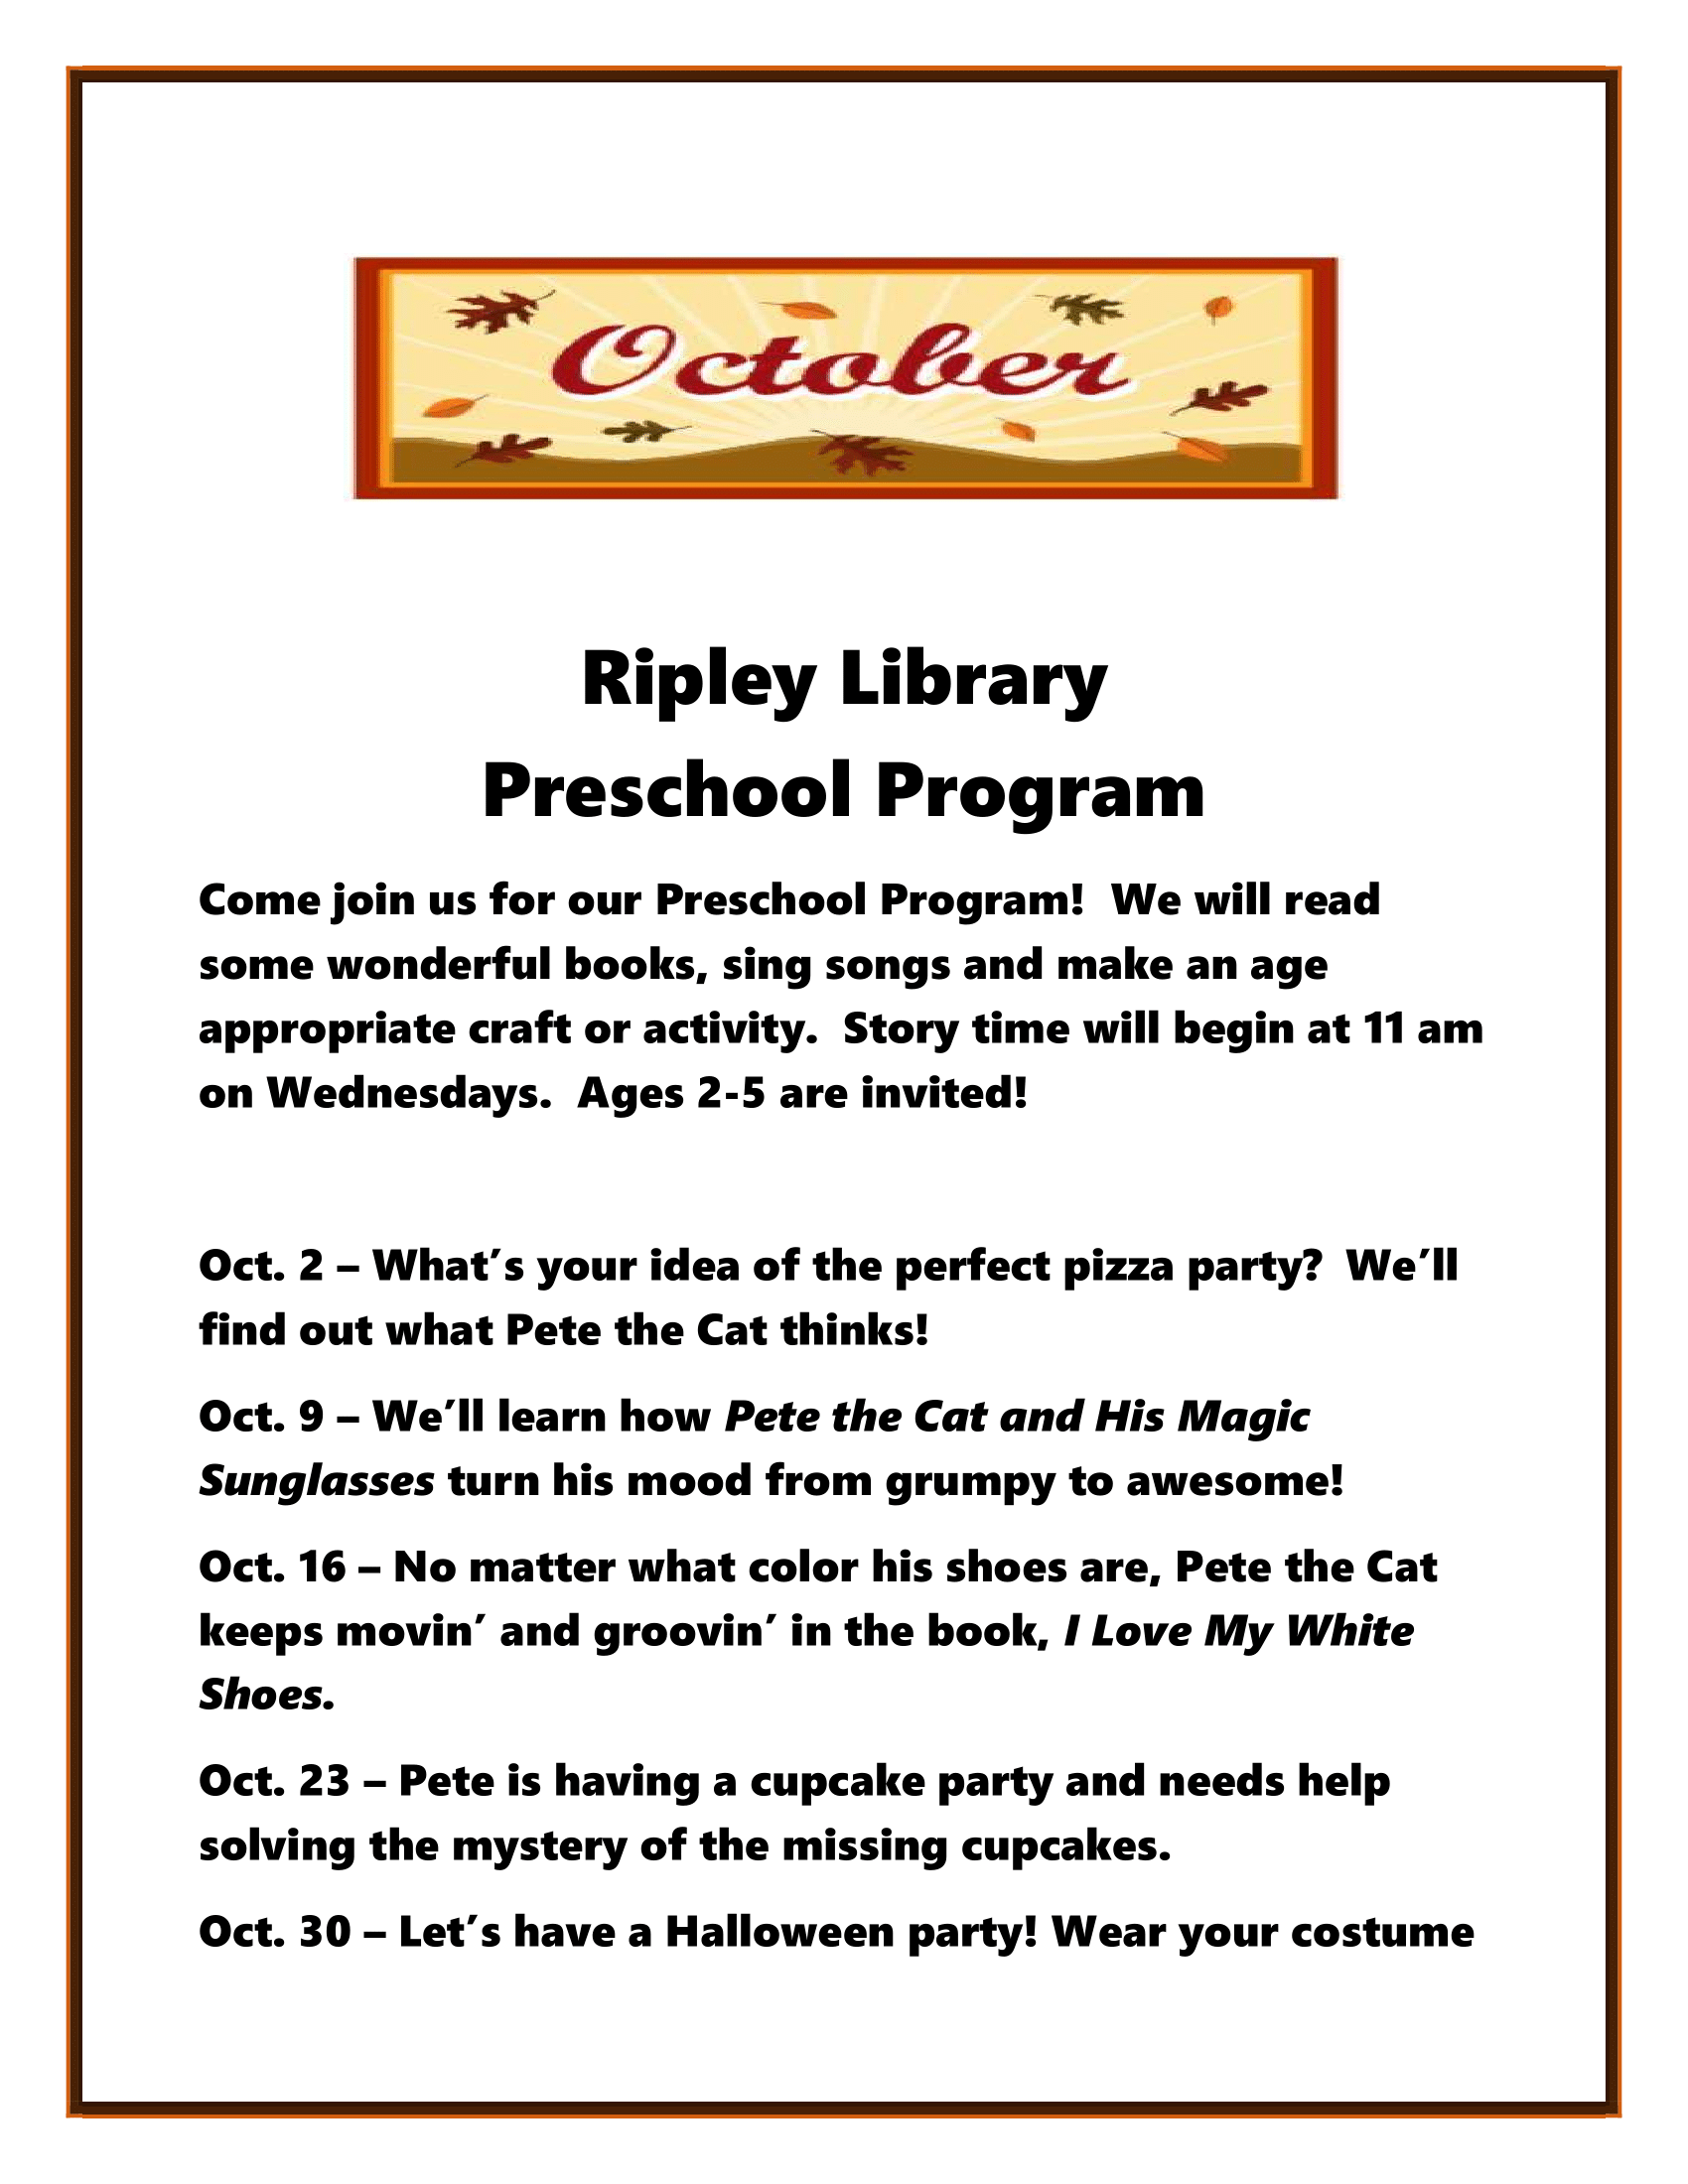 Preschool Program - Ripley